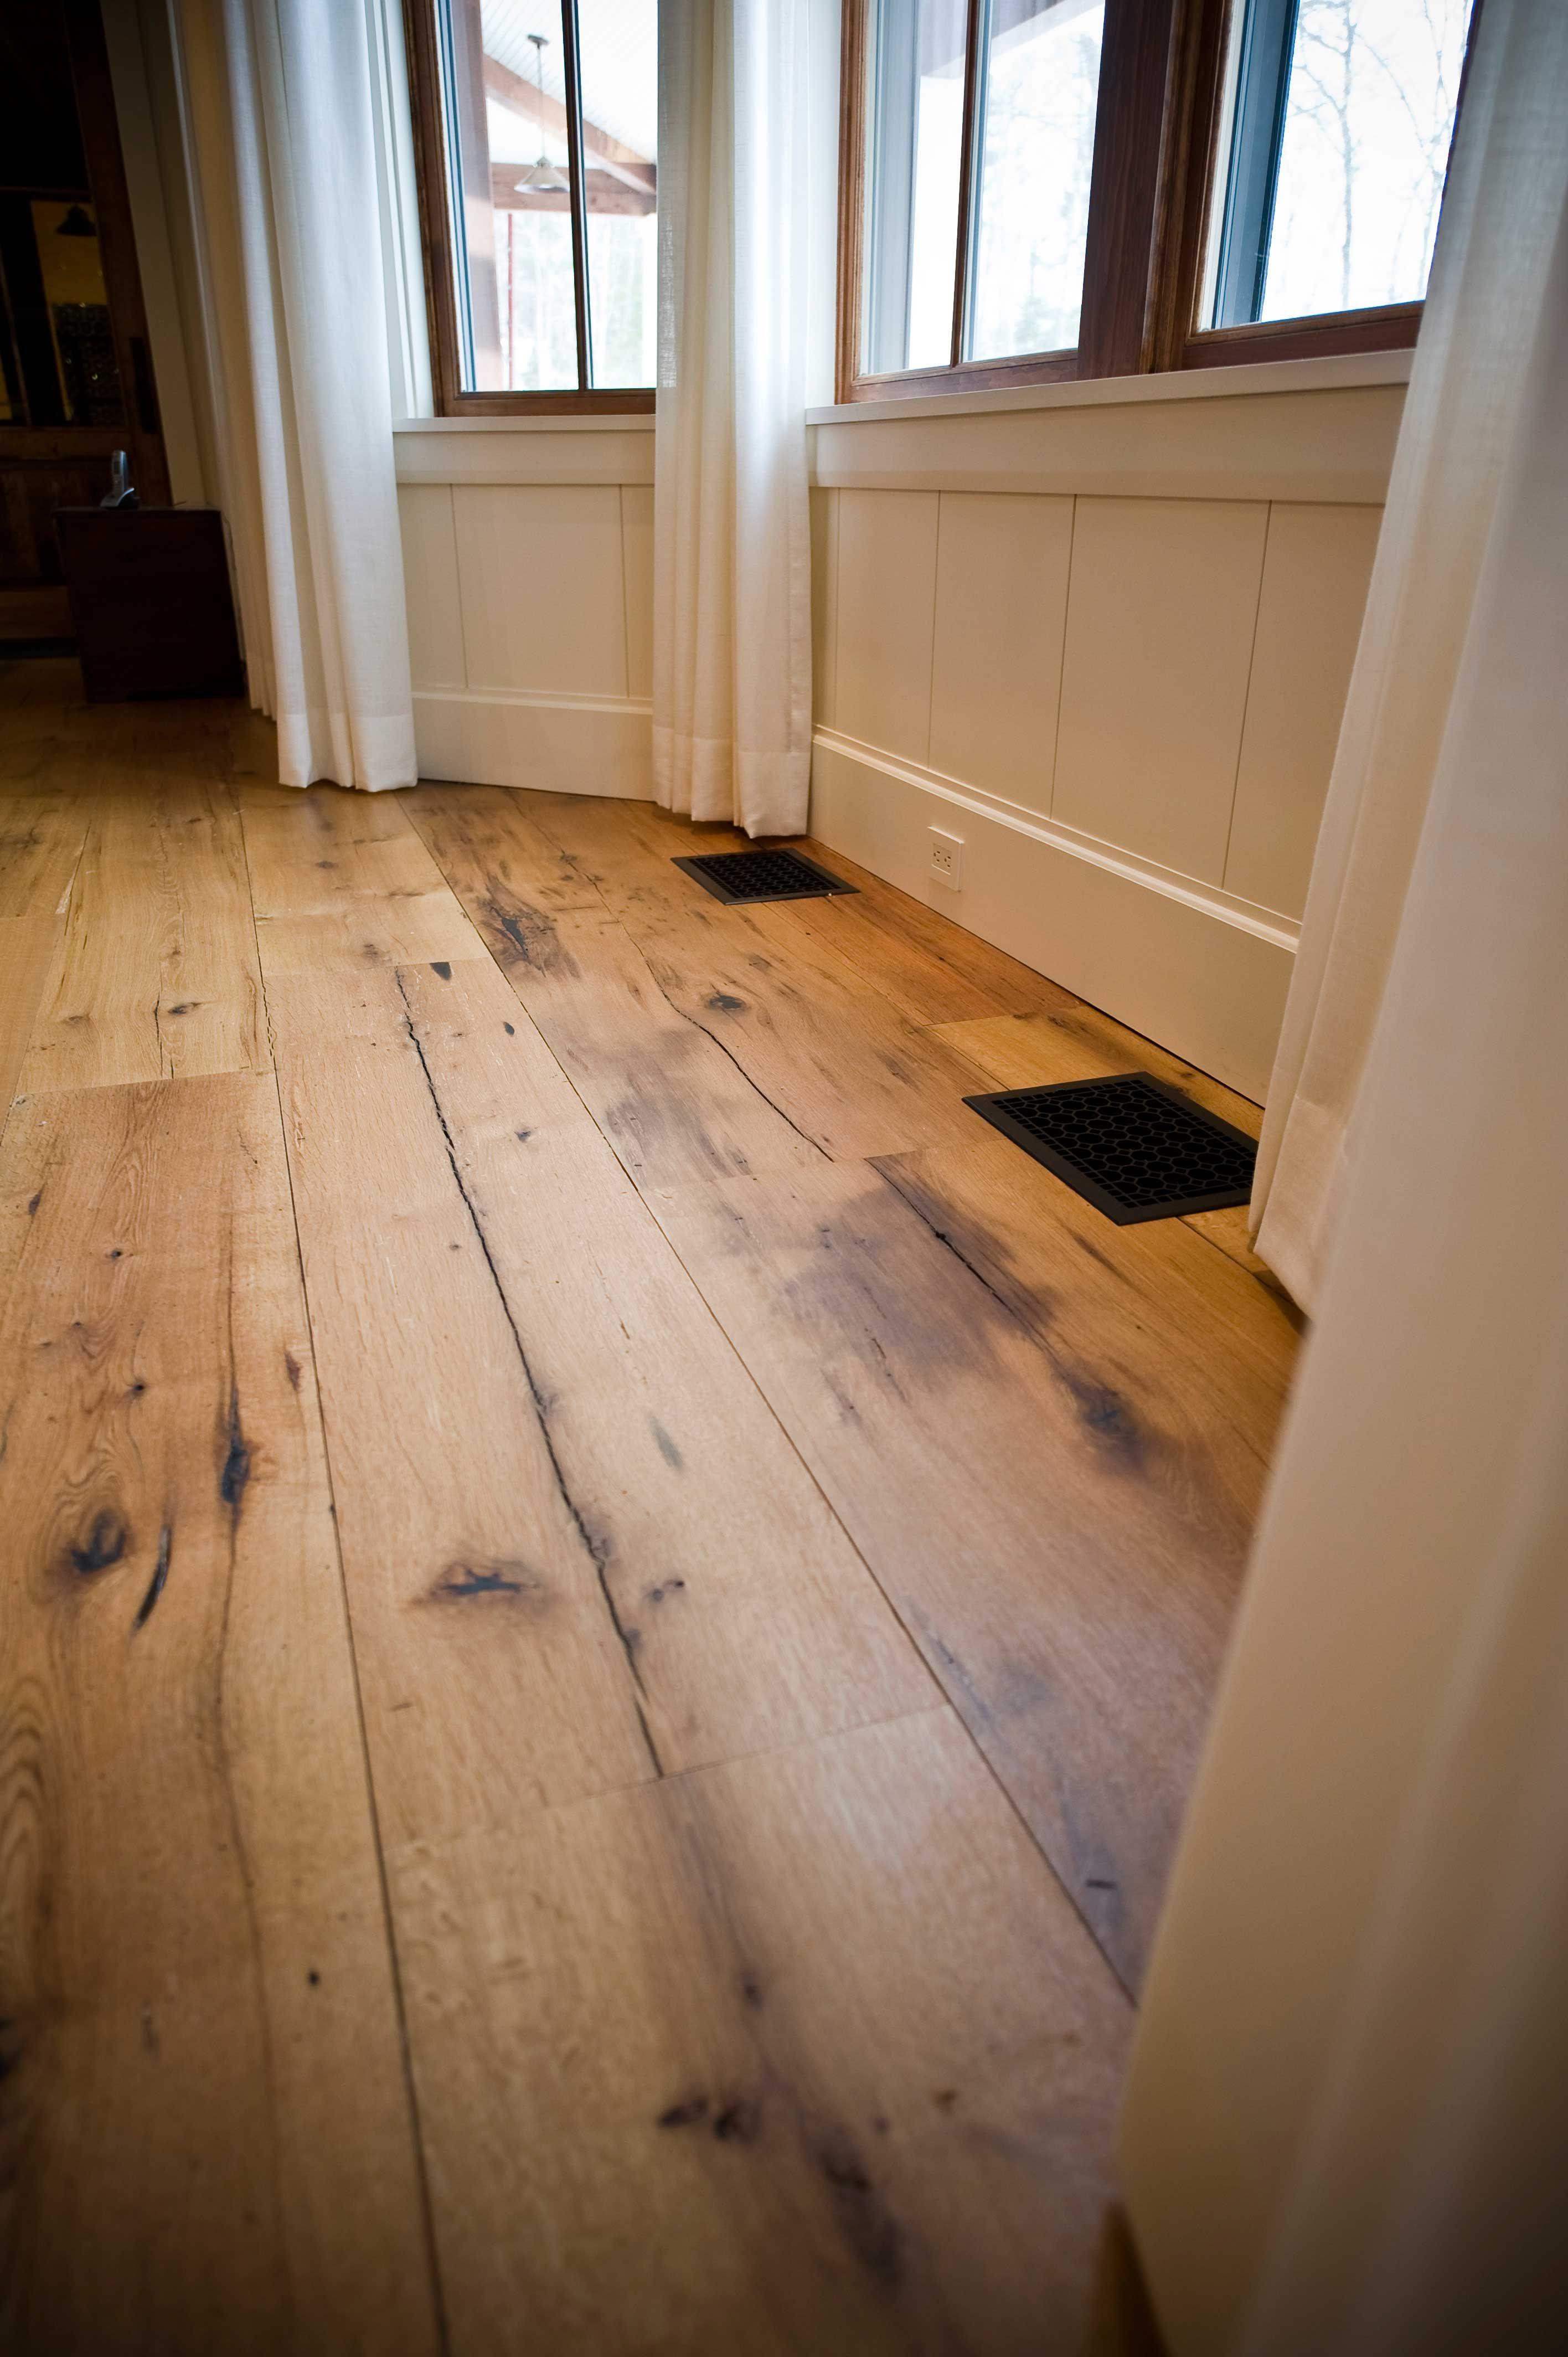 Photo of Splendid White Oak Wide Plank Flooring with Gorgeous Wide Plank Hardwood Flooring Longleaf Lumber Antique Oak – Morganallen Designs